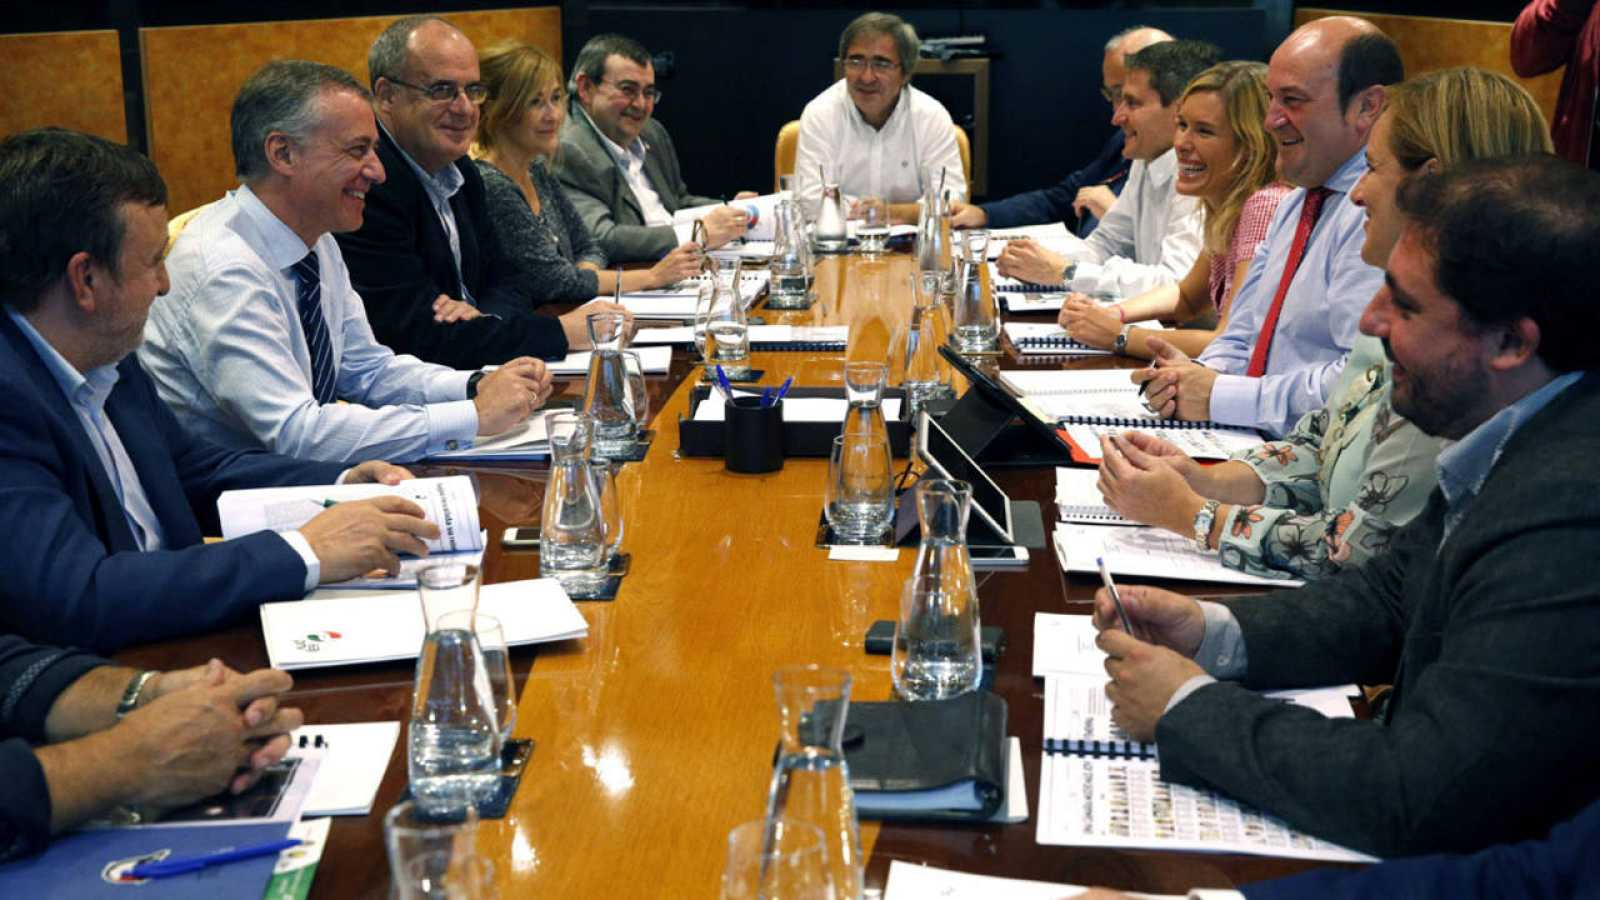 Los miembros del EBB presidida por Andoni Ortuzar, (tercero por la derecha) y el lehendakari Iñigo Urkullu, segundo por la izquierda